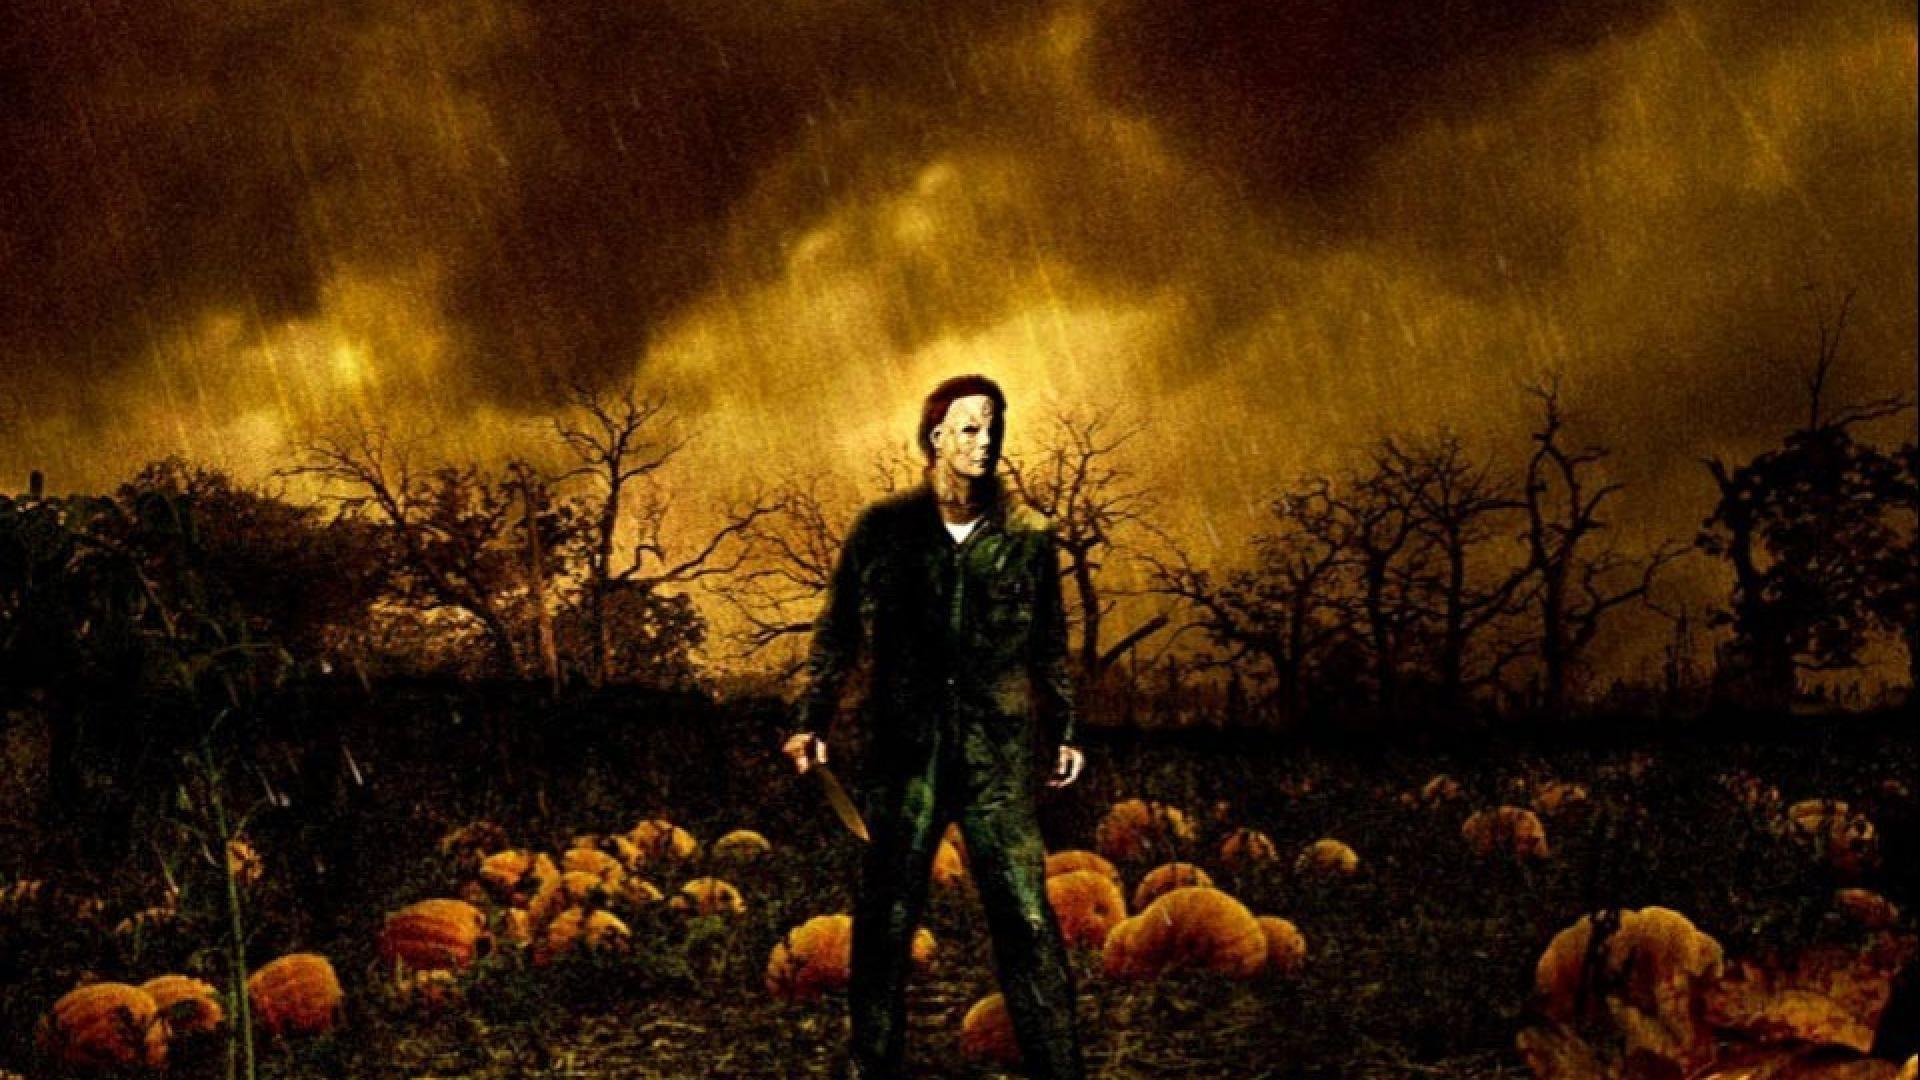 10 Best Halloween Michael Myers Wallpapers FULL HD 1920×1080 For PC Desktop 2020